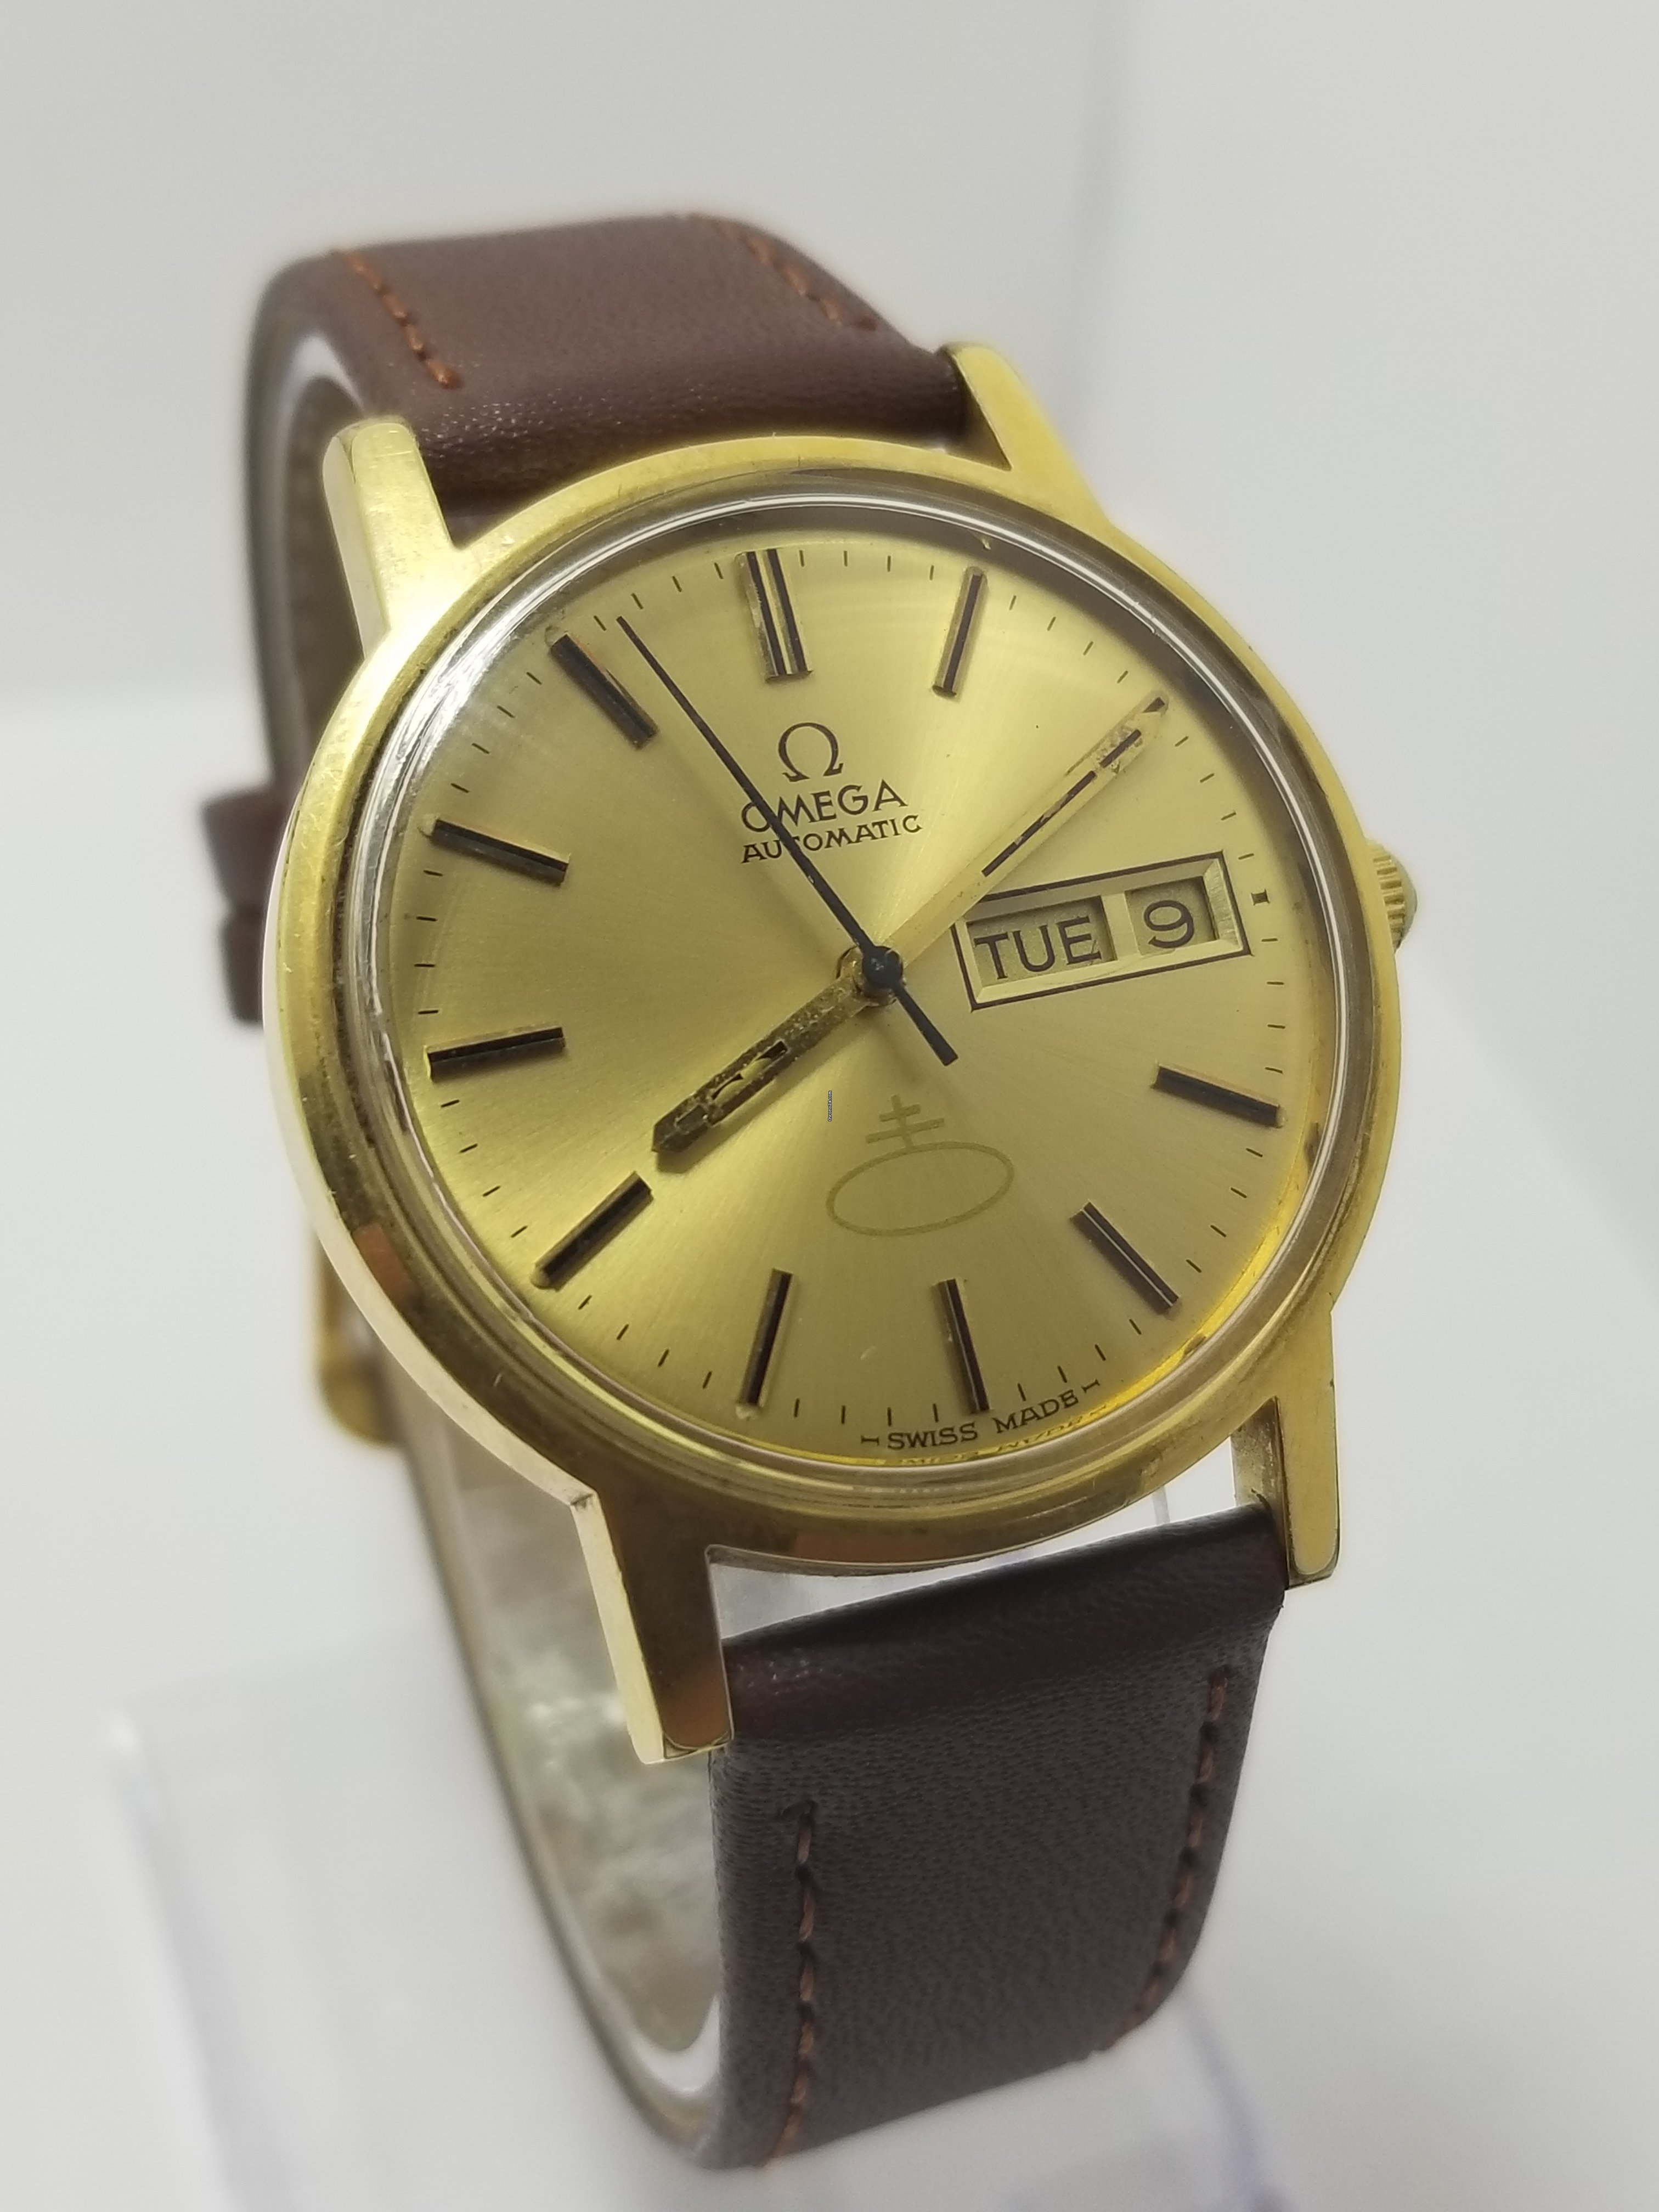 Omega Vintage OMEGA Automatic cal 1022 sold on Chrono24